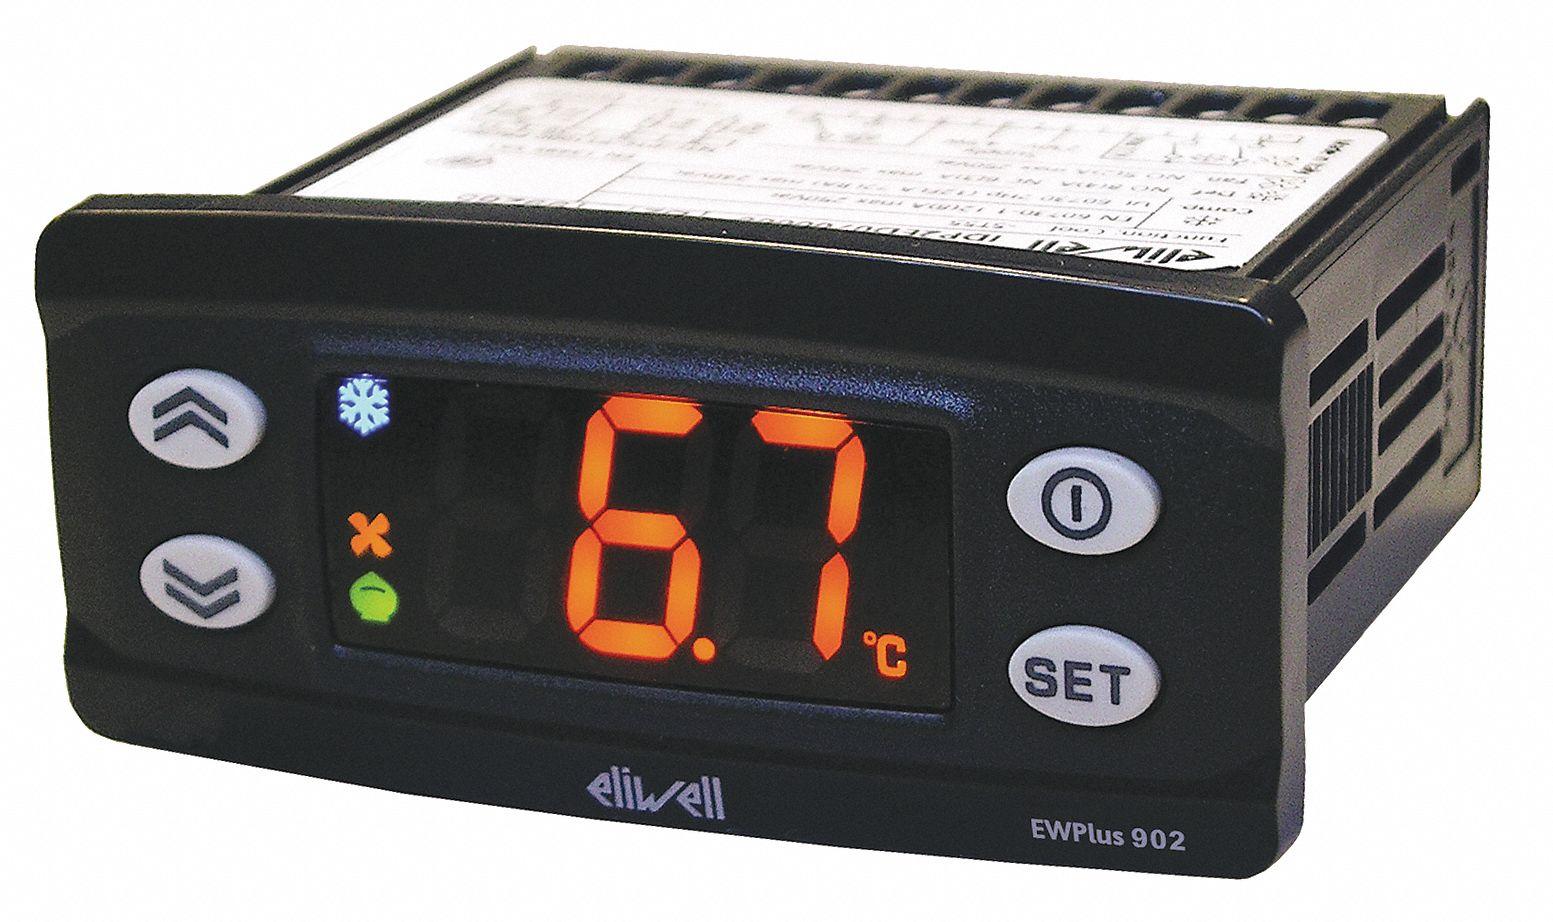 ELIWELL Temperature Control, Digital, SPST, 120V - 12Z412|EWPLUS902-115 -  Grainger